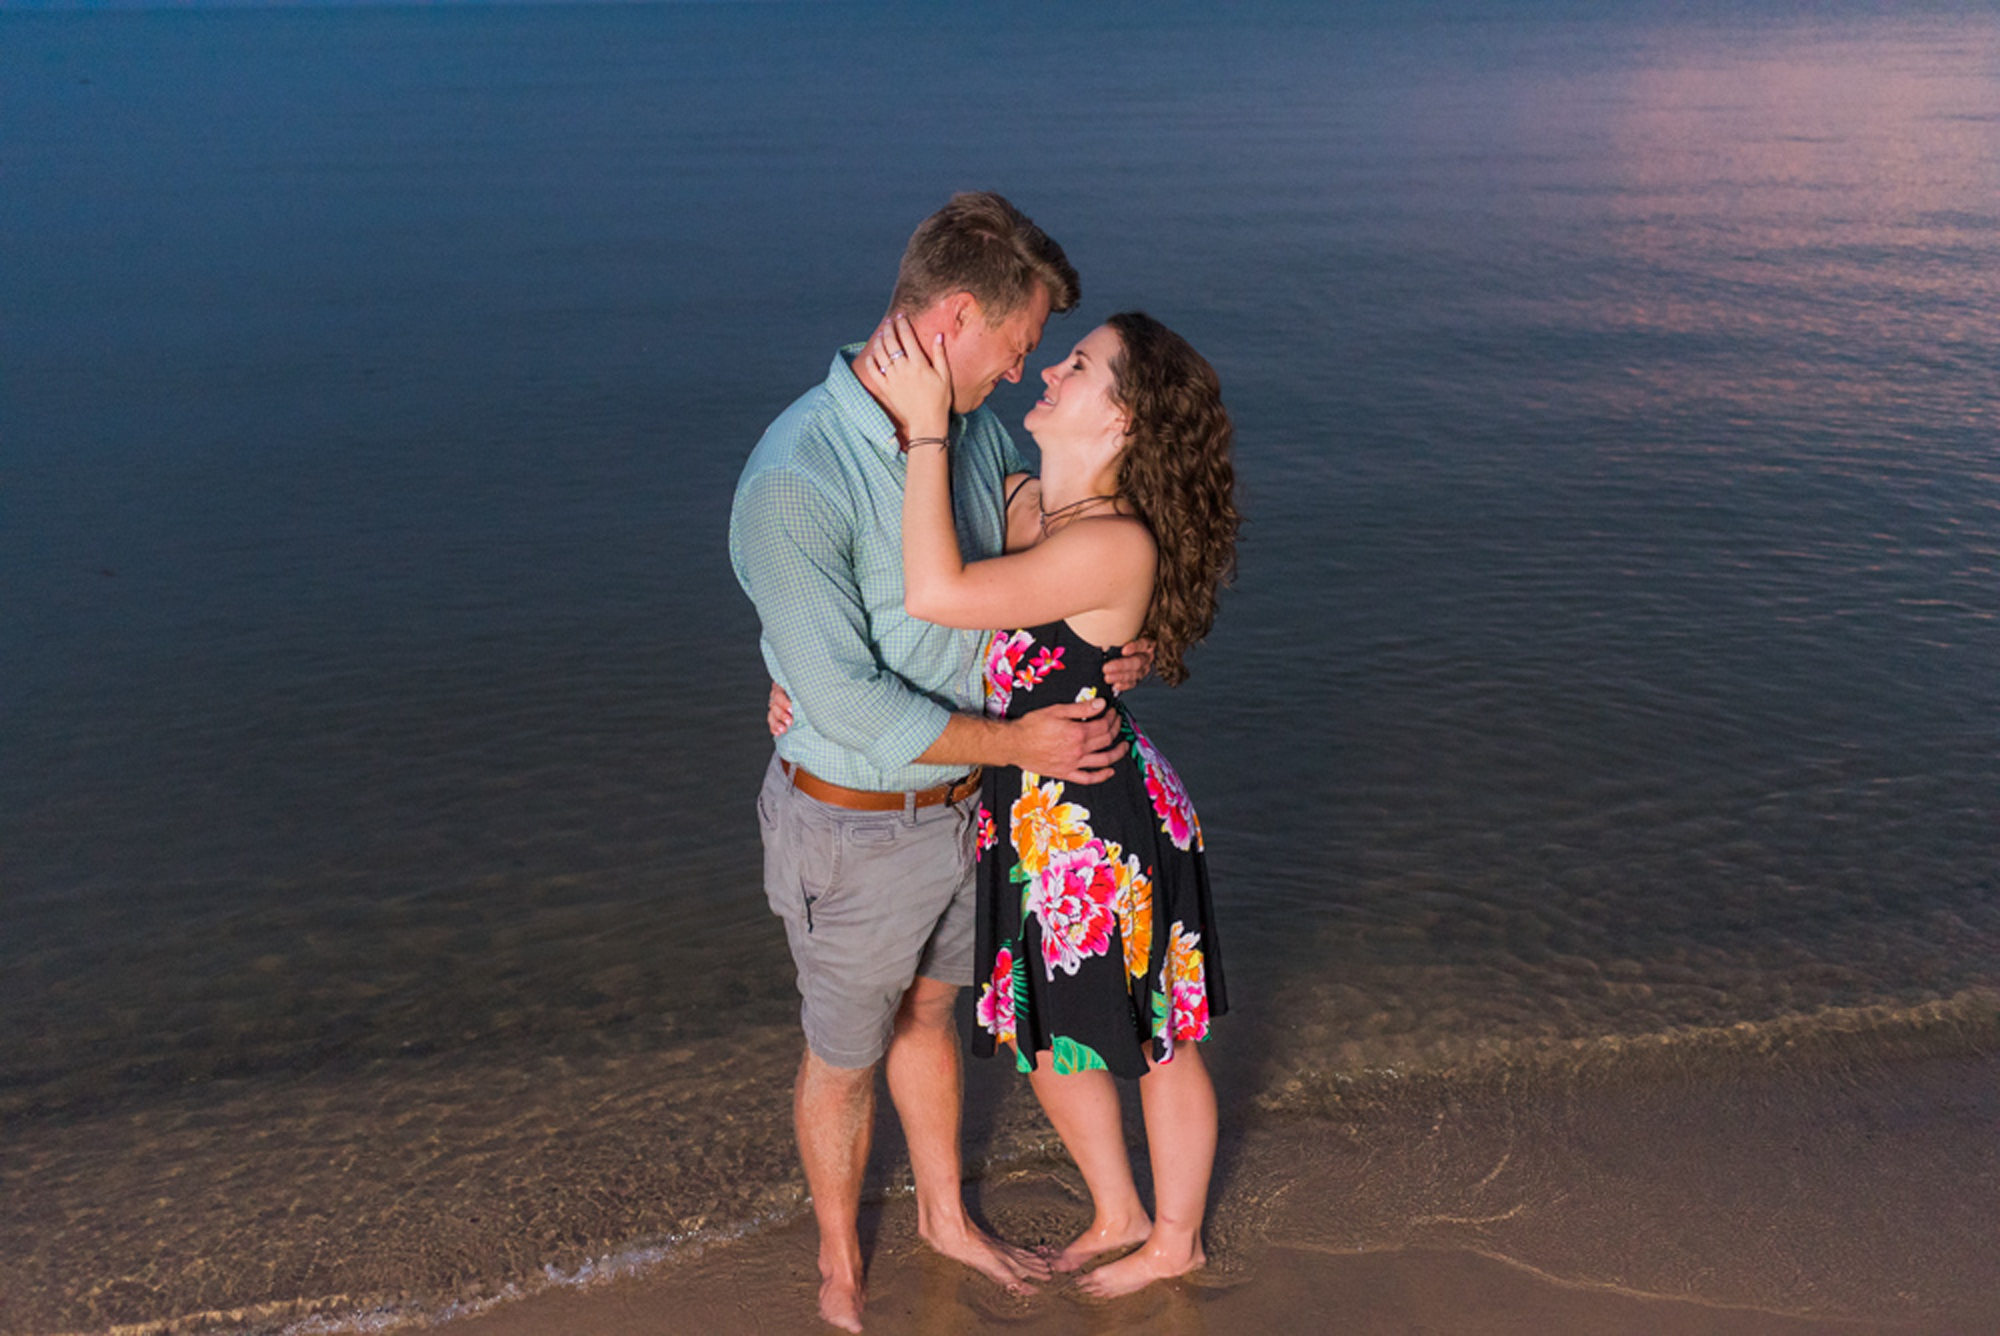 south-haven-michigan-beach-engagement-proposal-photographer-sydney-marie (33).jpg